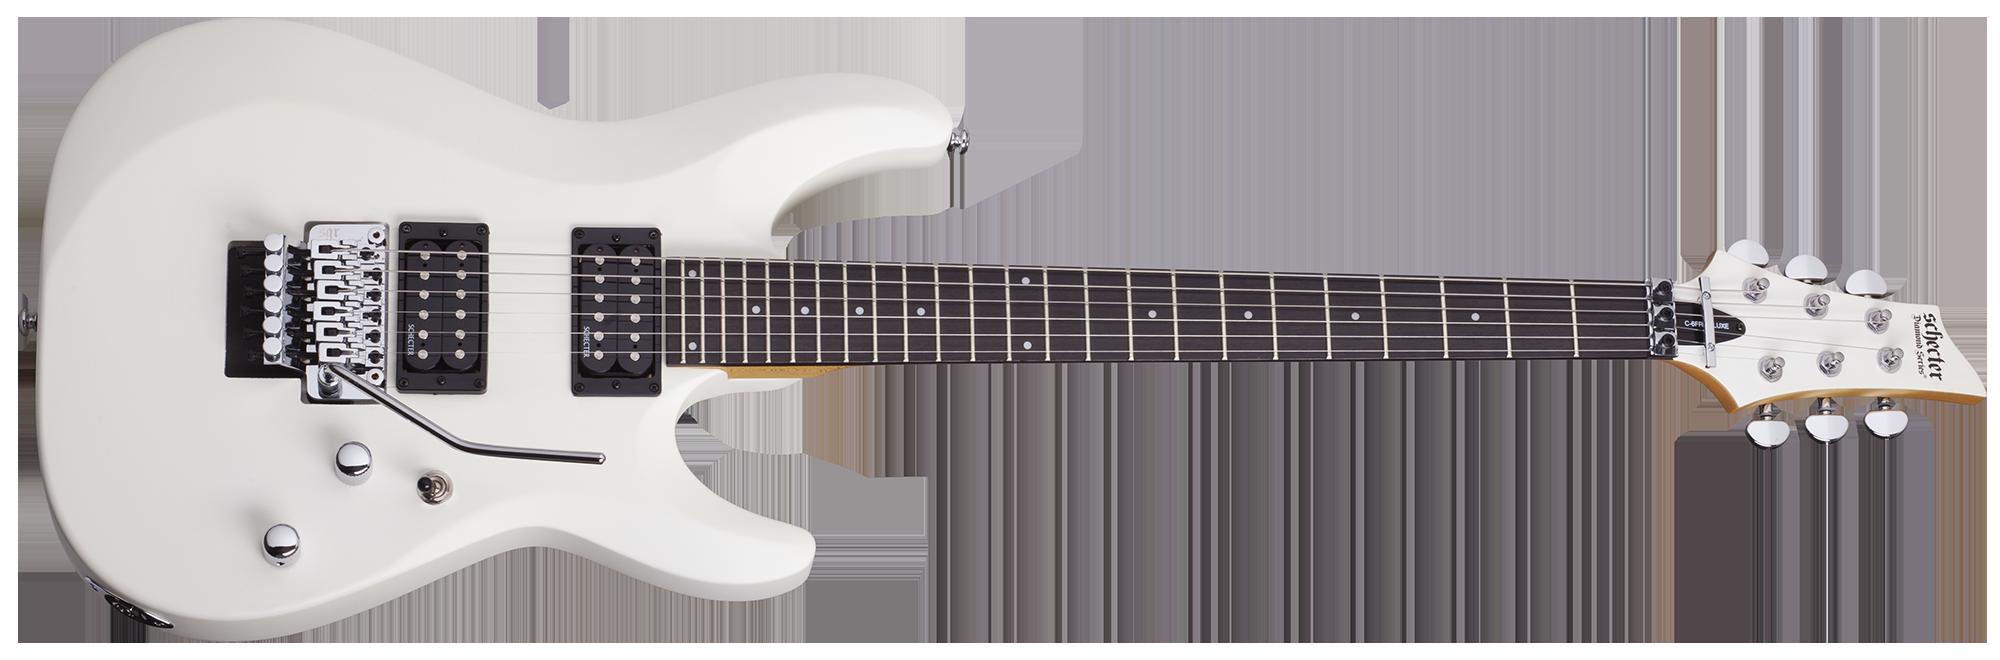 C-6 FR Deluxe Satin White (SWHT) SKU #435